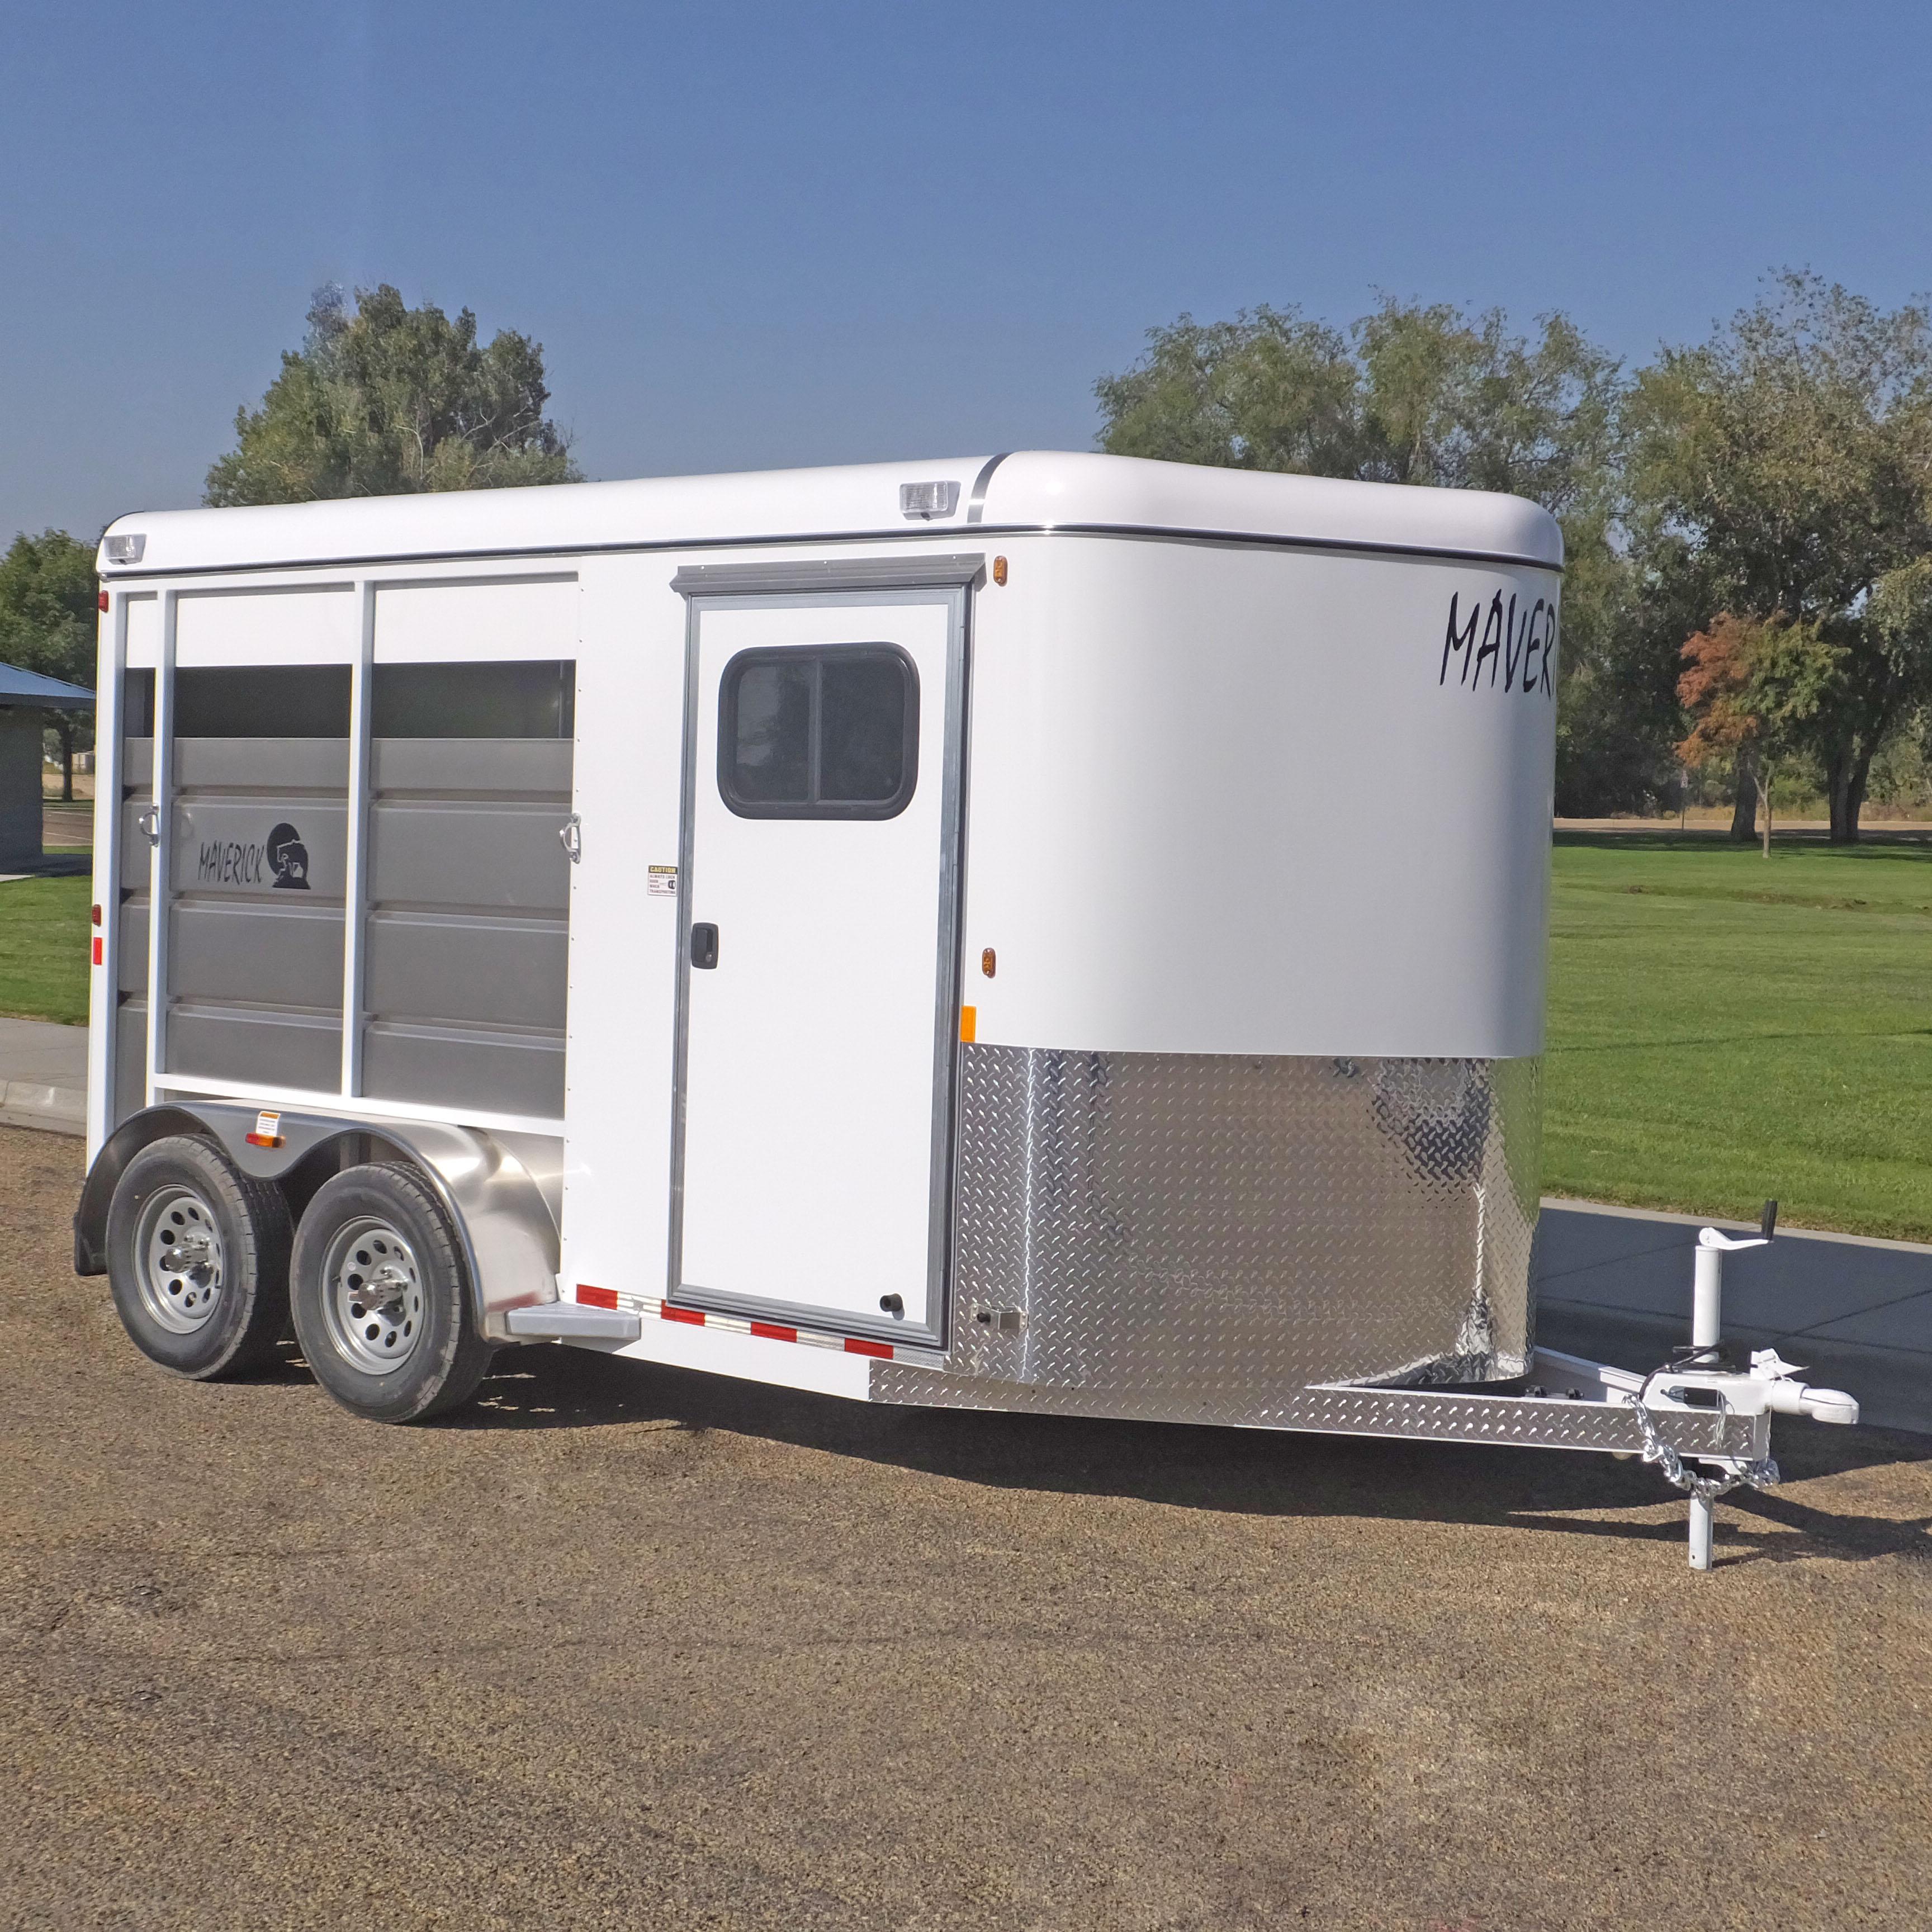 Maverick Highside (HS) Steel 2 Horse Trailer - Standard Rv style tack door w/screened window.